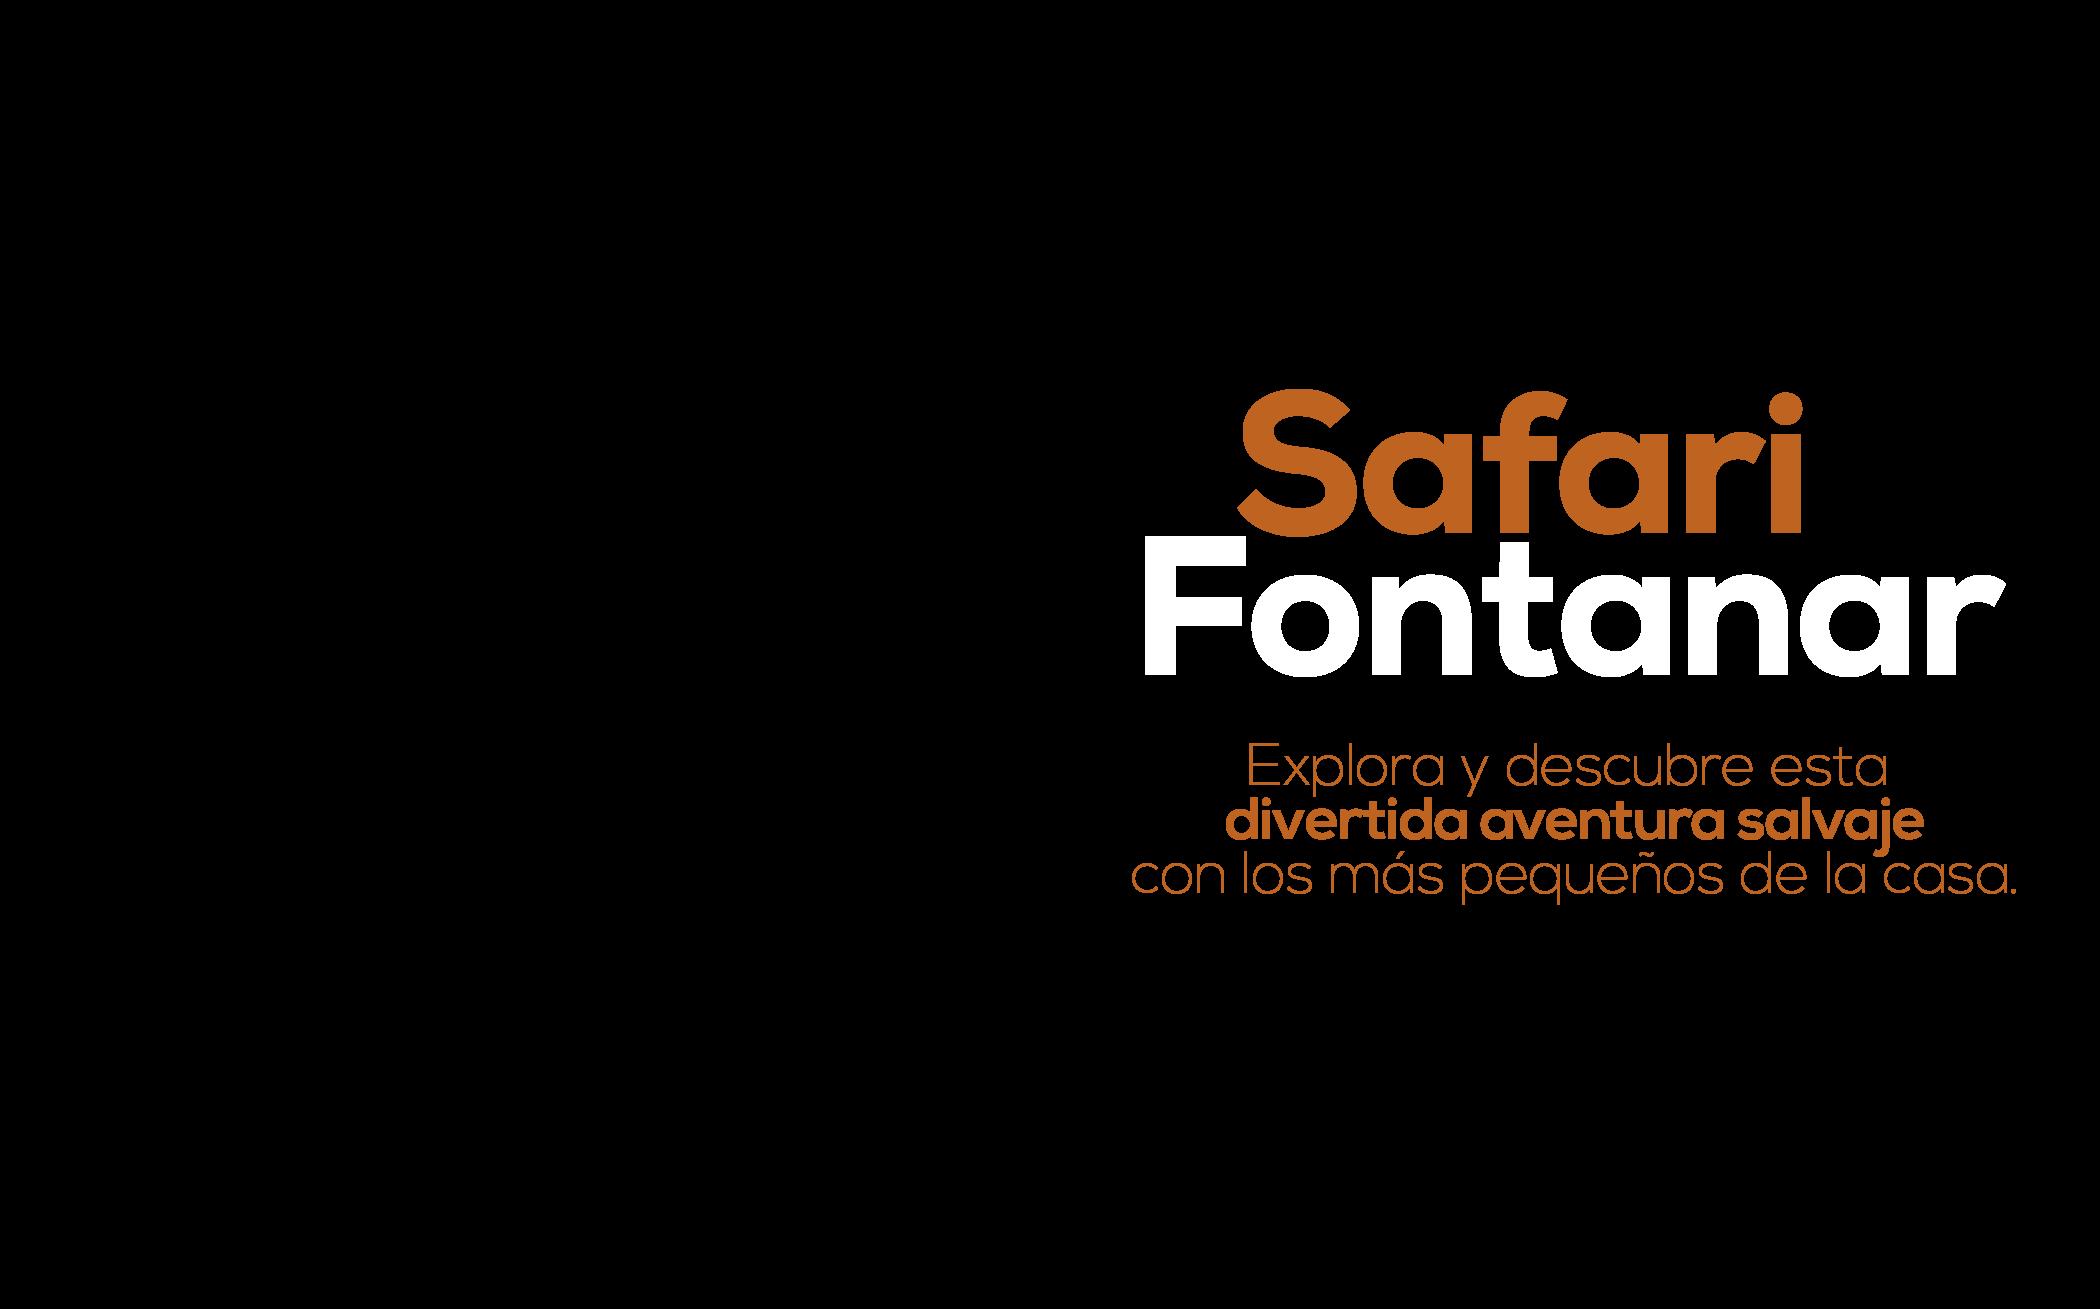 texto_safari_Fontanar